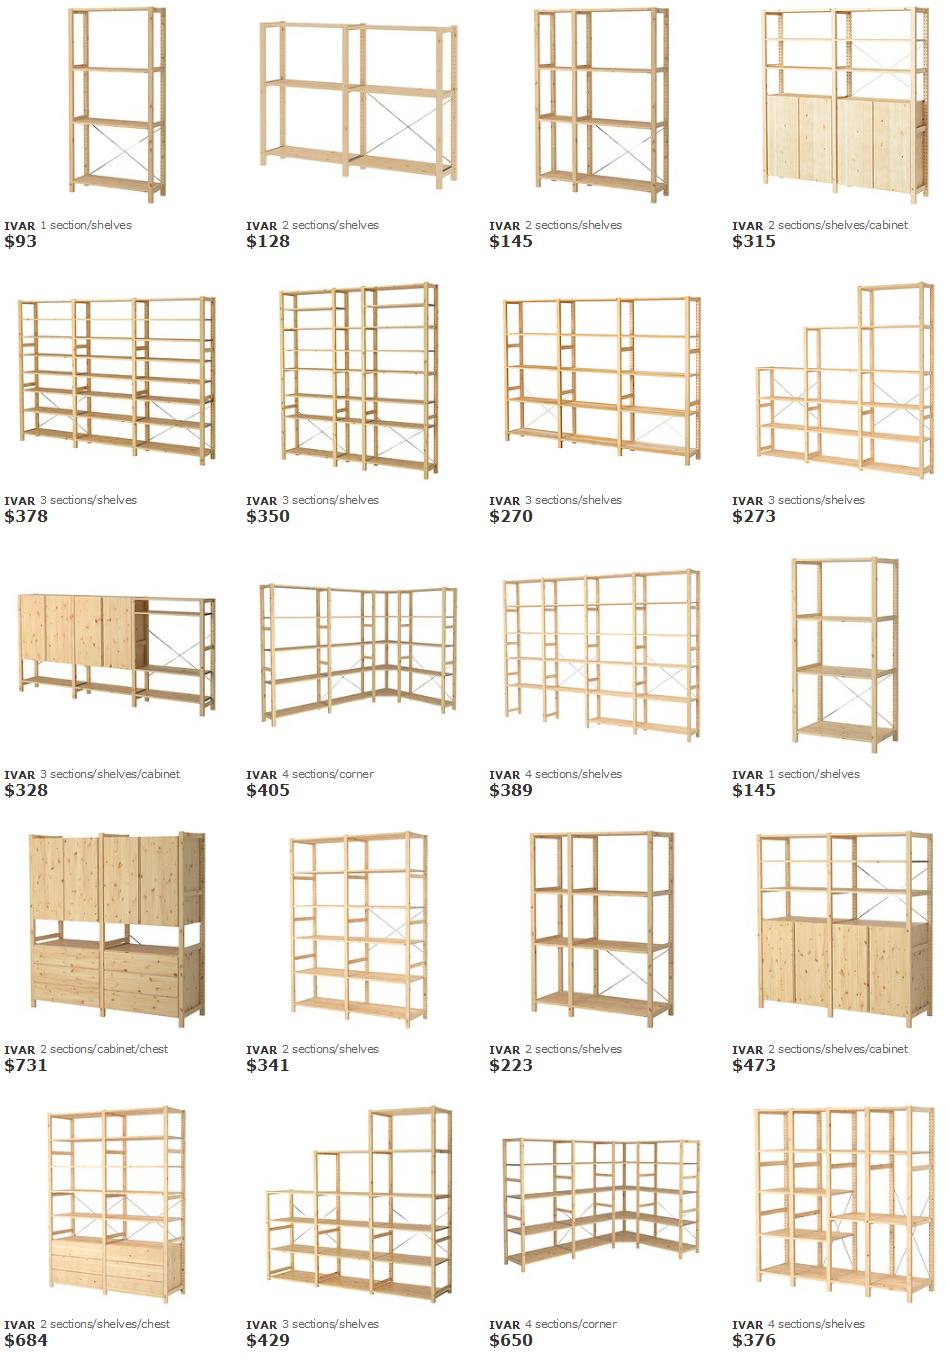 Ikea Scaffali Legno Ivar ikea ivar shelving system … (with images) | ikea inspiration